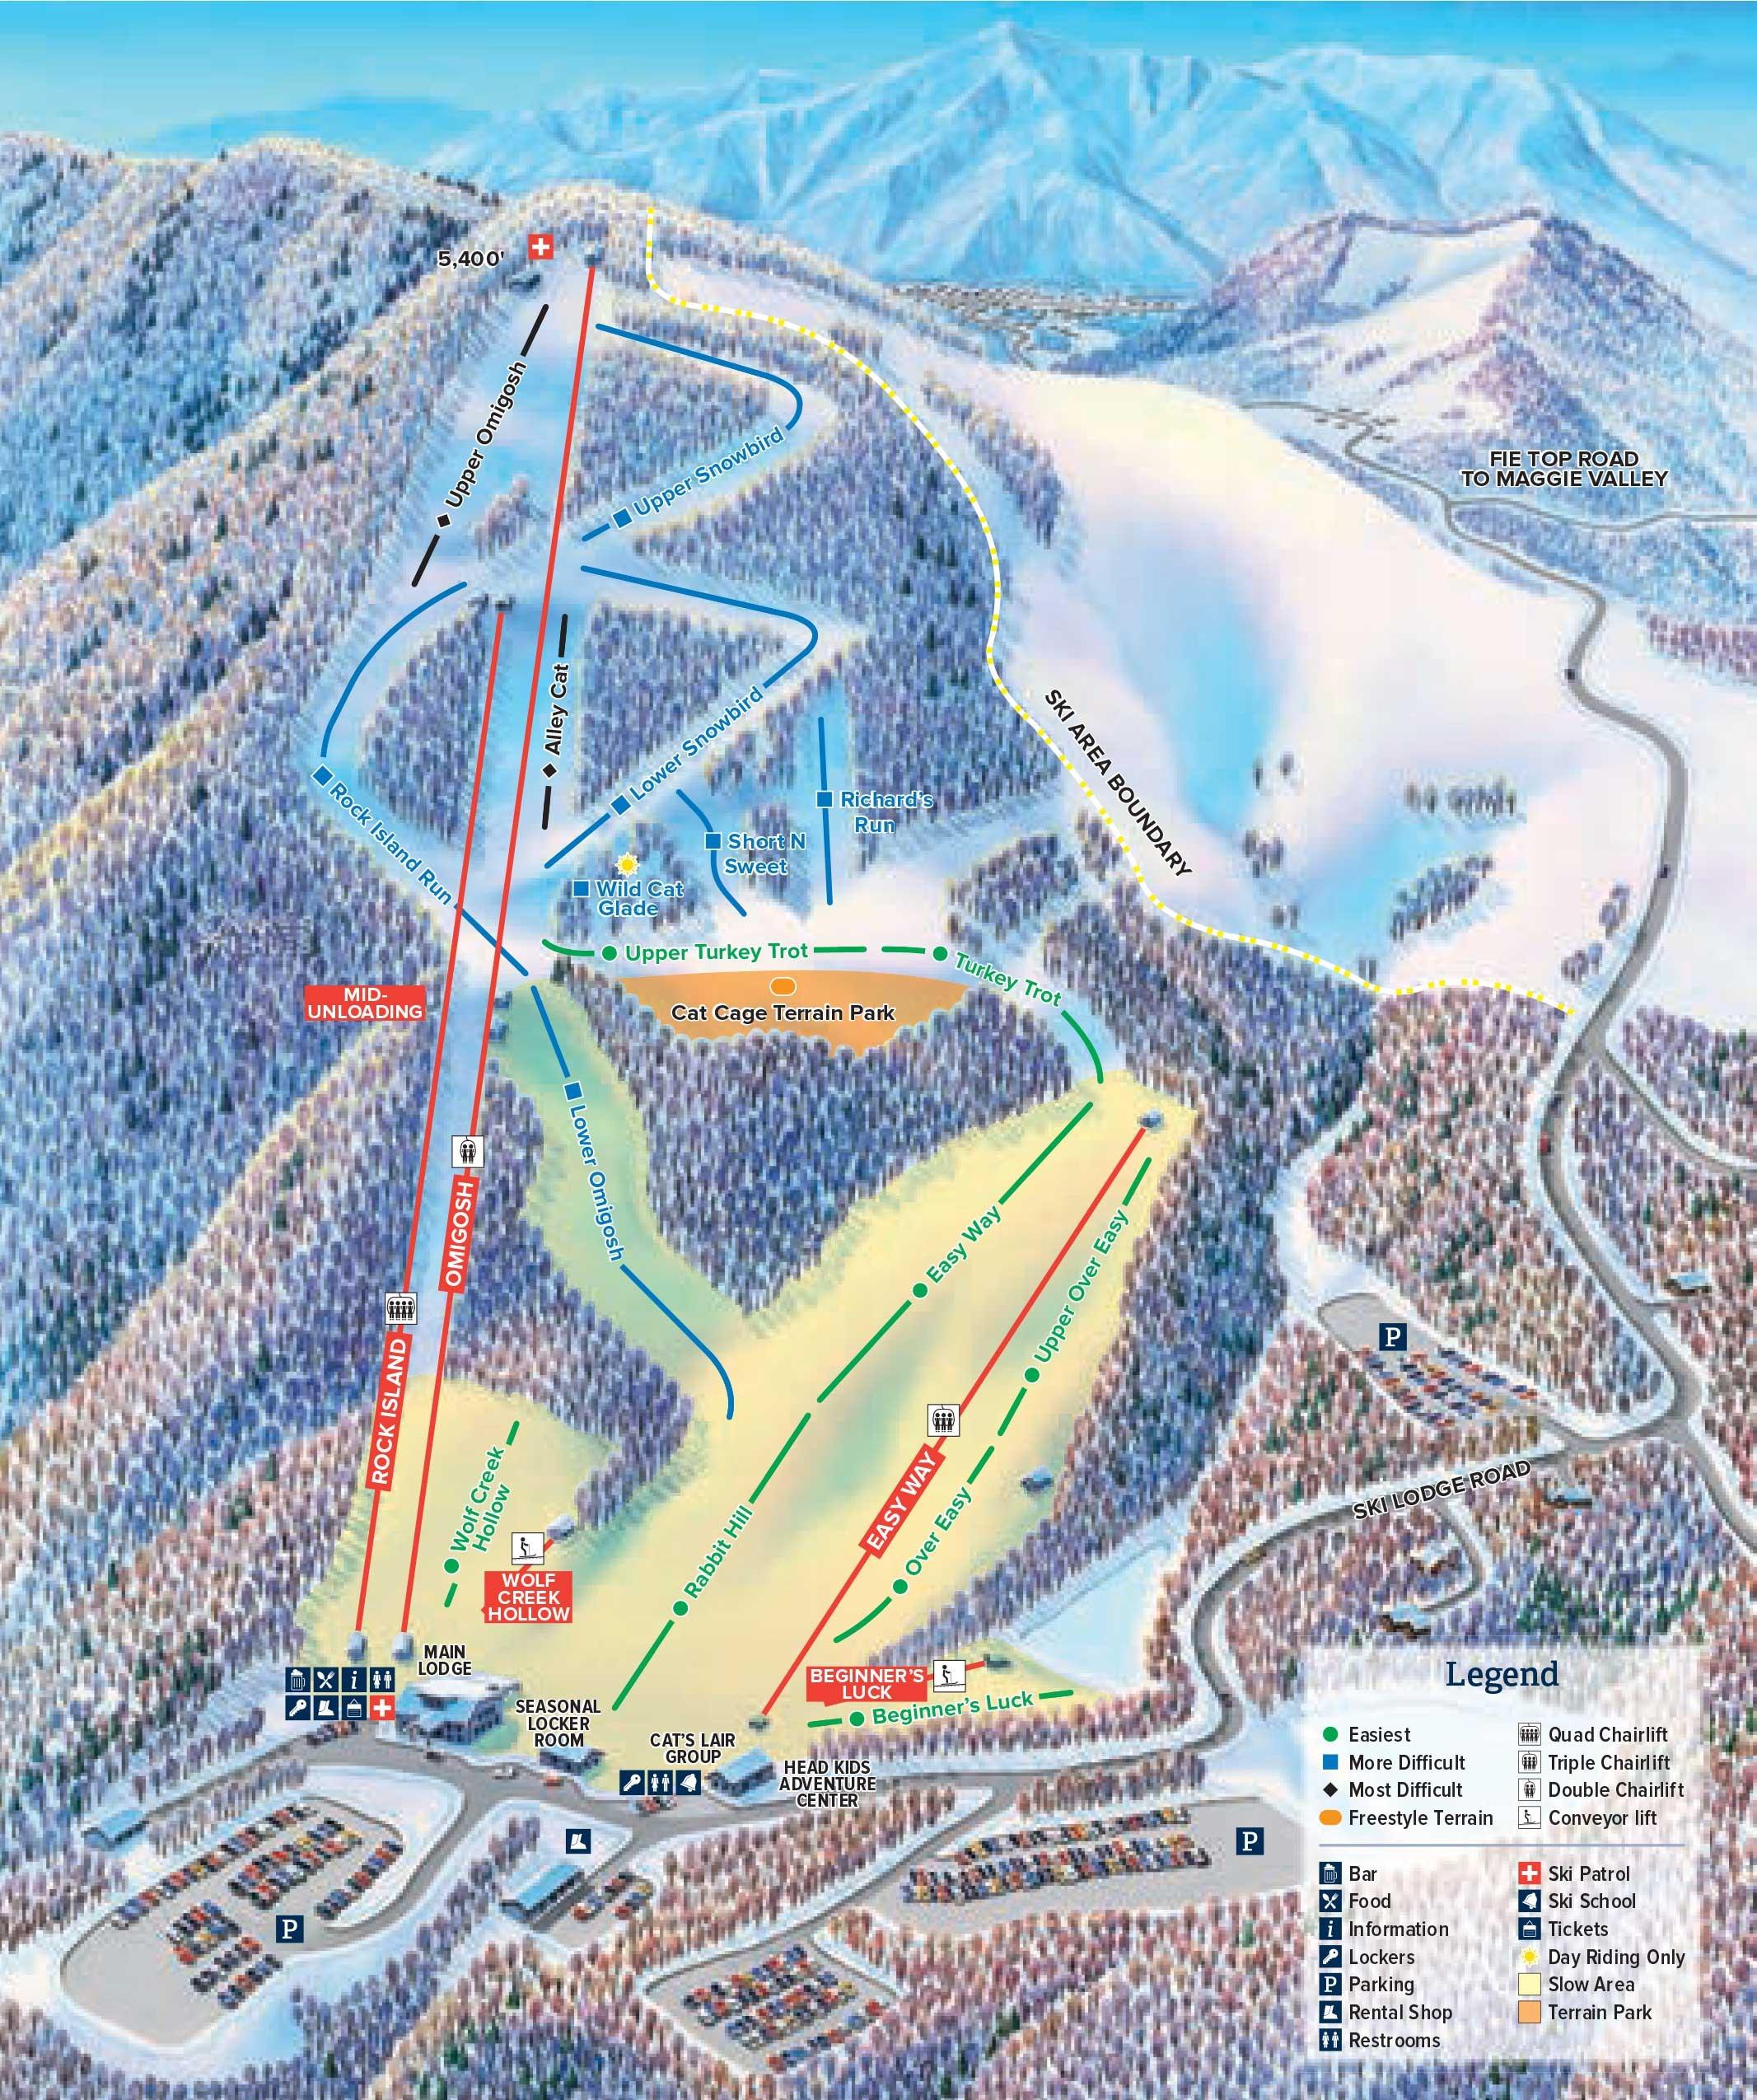 Cataloochee Ski Area Trail Map